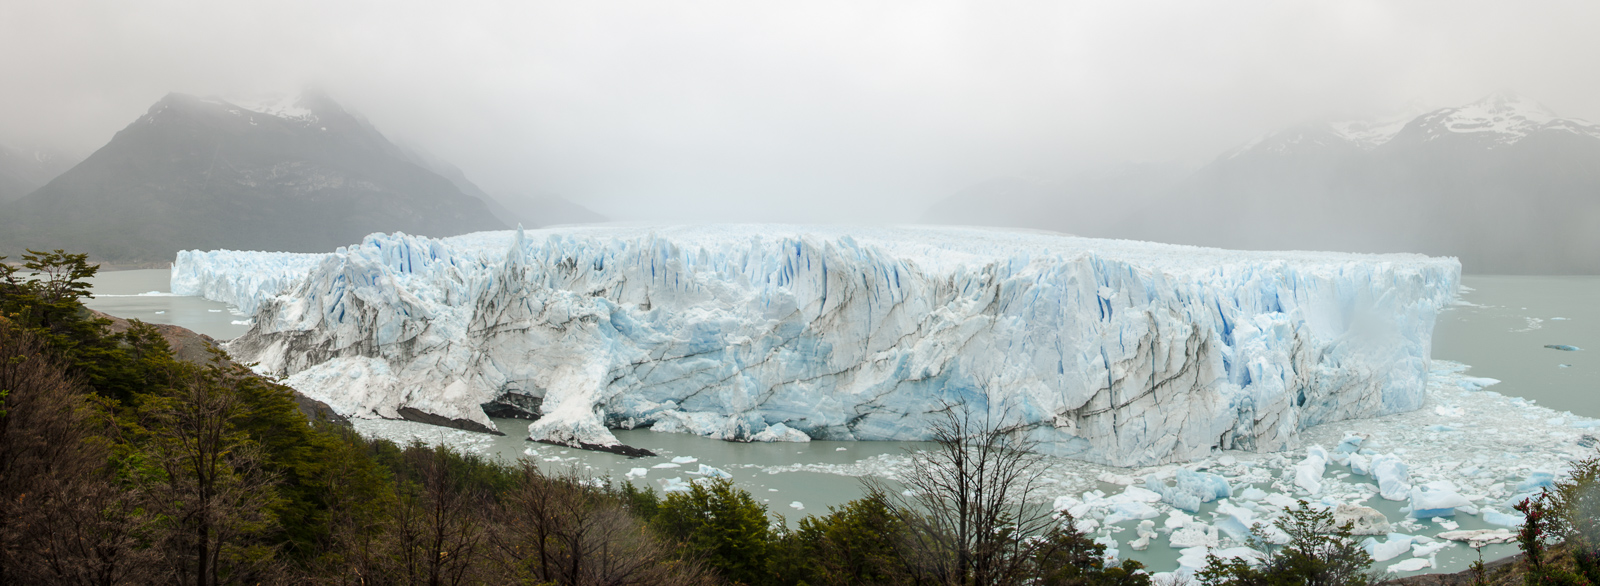 Květnové panorama – argentinský ledovec Perito Moreno